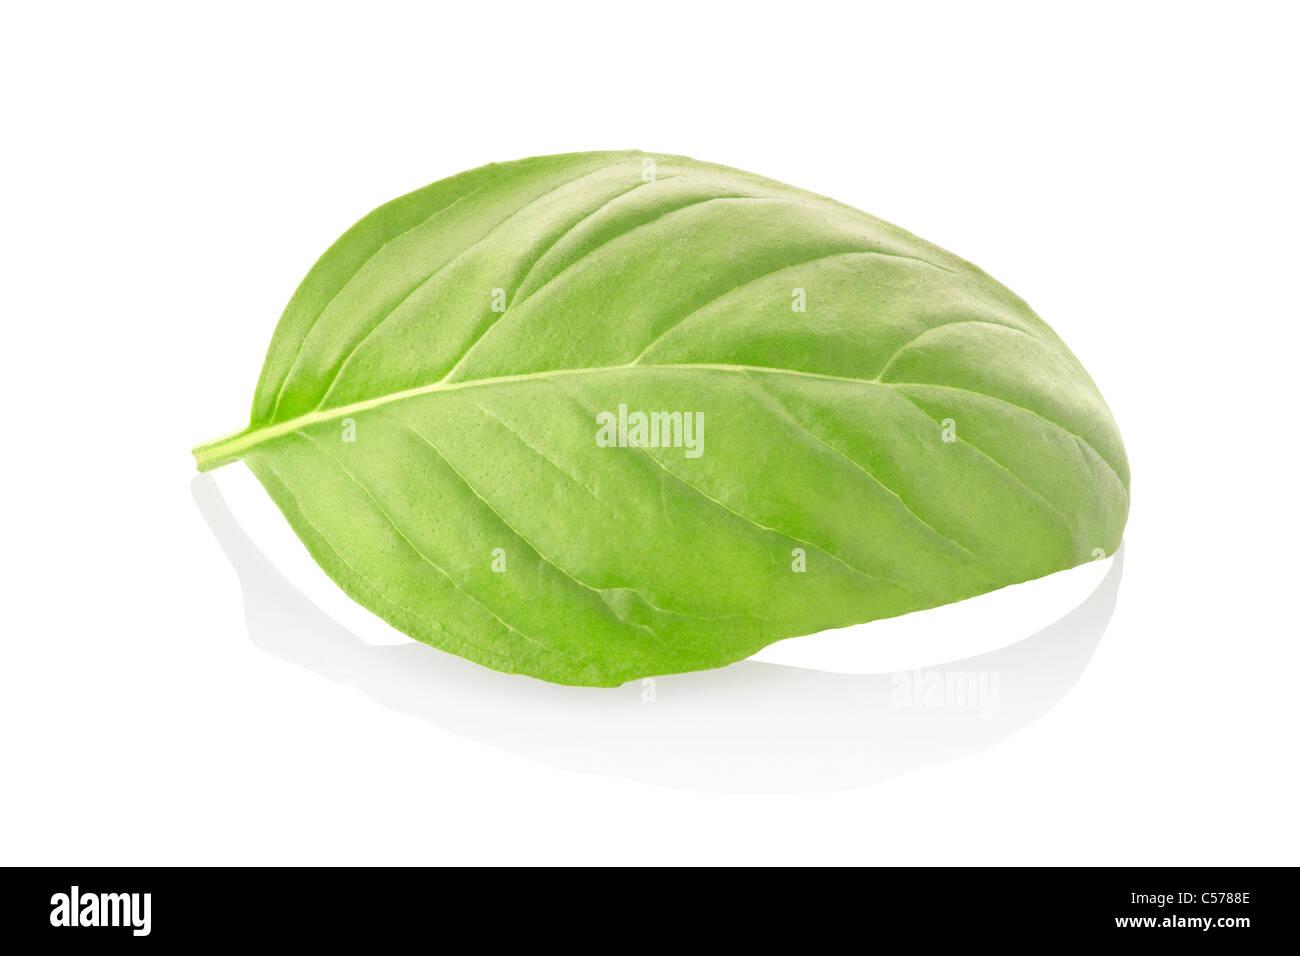 Single basil leaf cut out - Stock Image